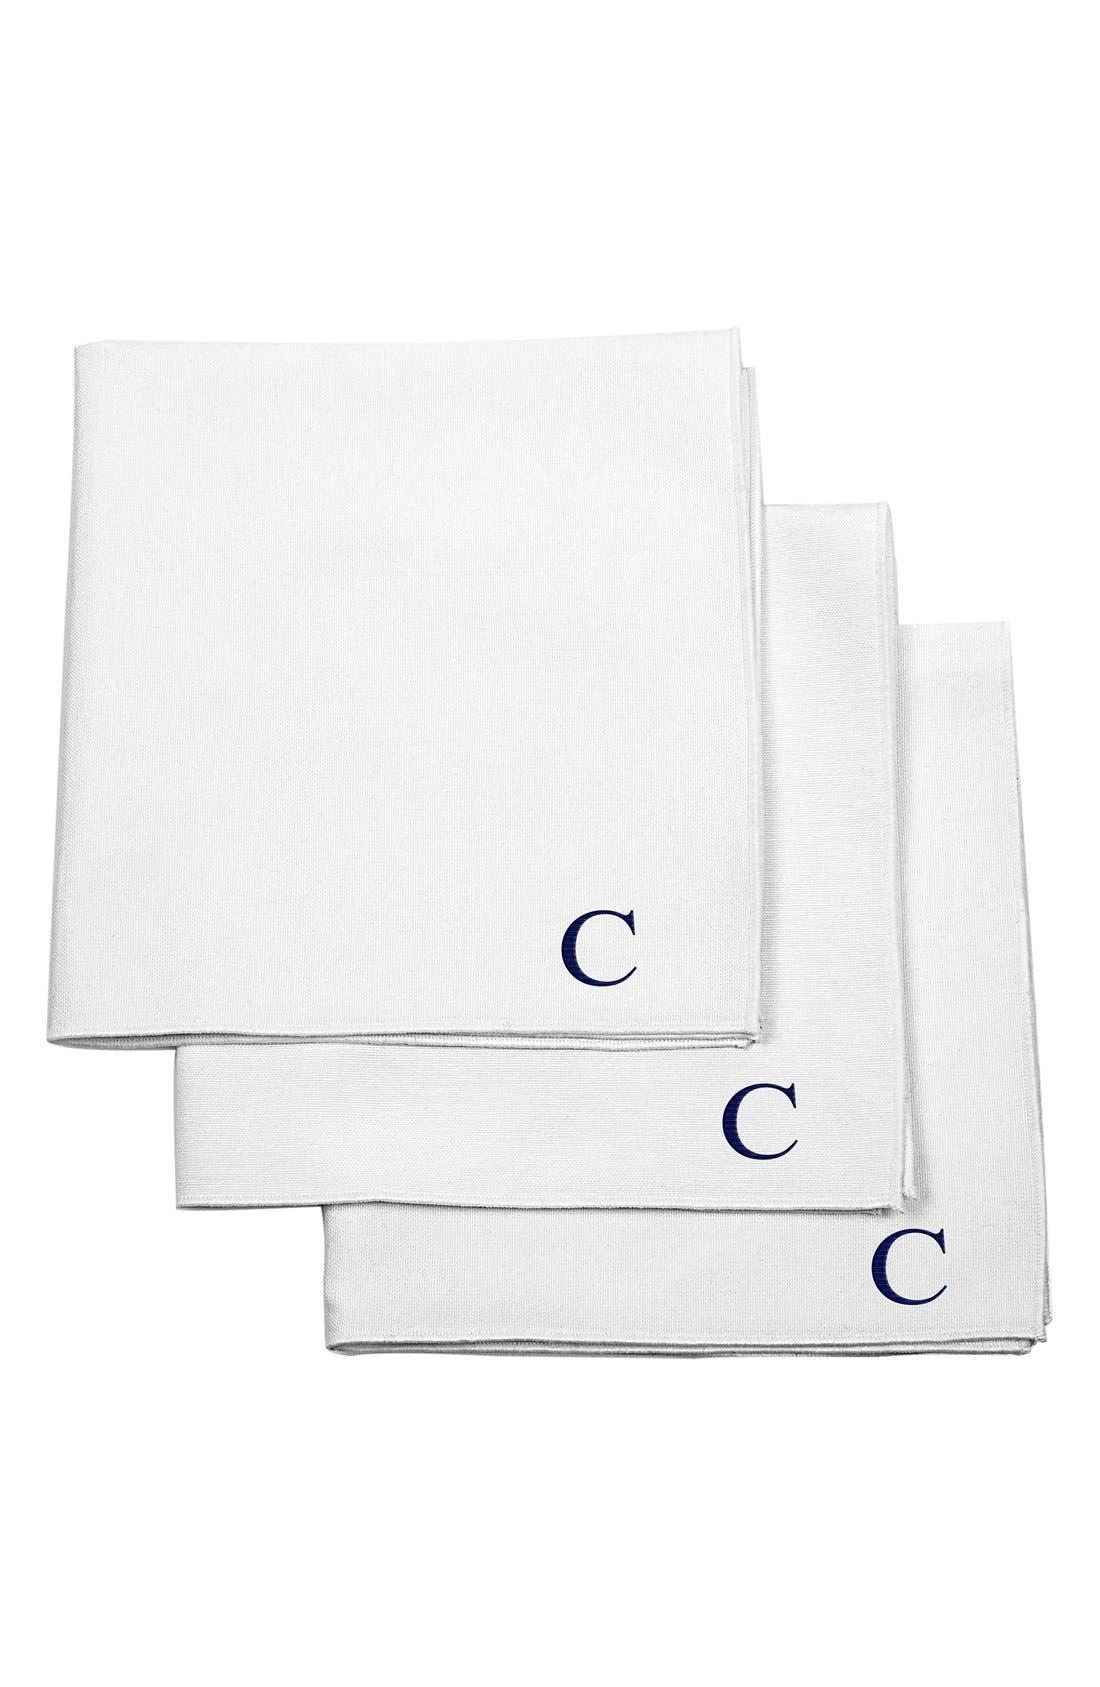 Main Image - Cathy's Concepts Monogram Cotton Handkerchiefs (Set of 3)